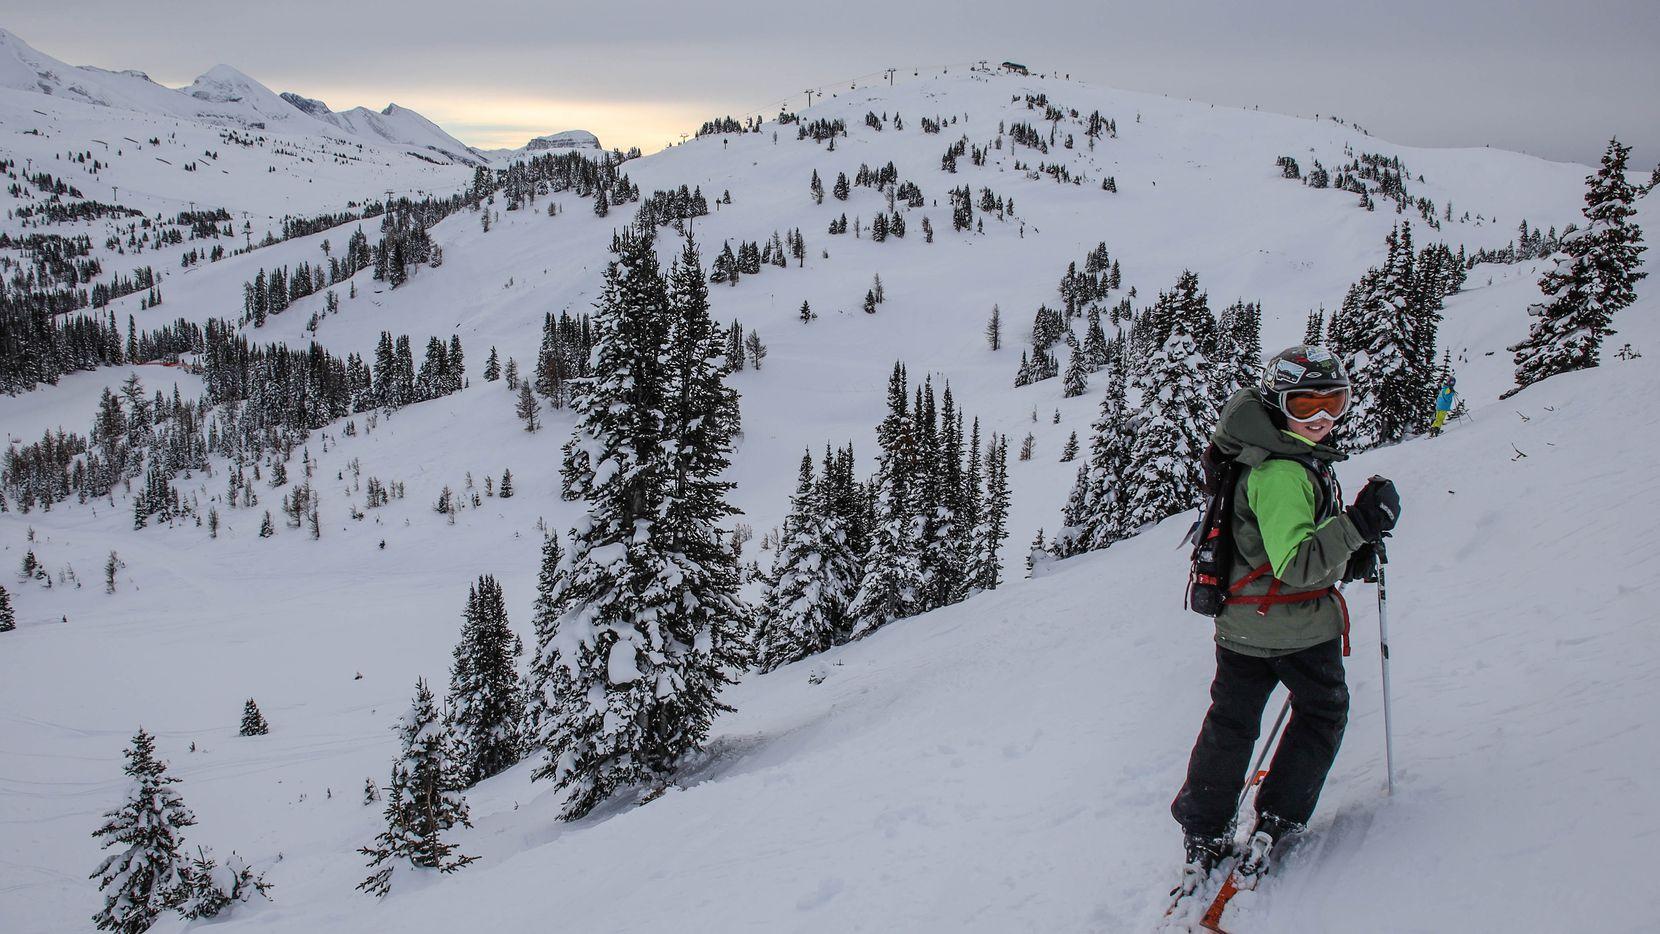 Reid Irwin, 11, enjoys the powder and the scenery in Banff National Park. The region's ski season runs through late April.